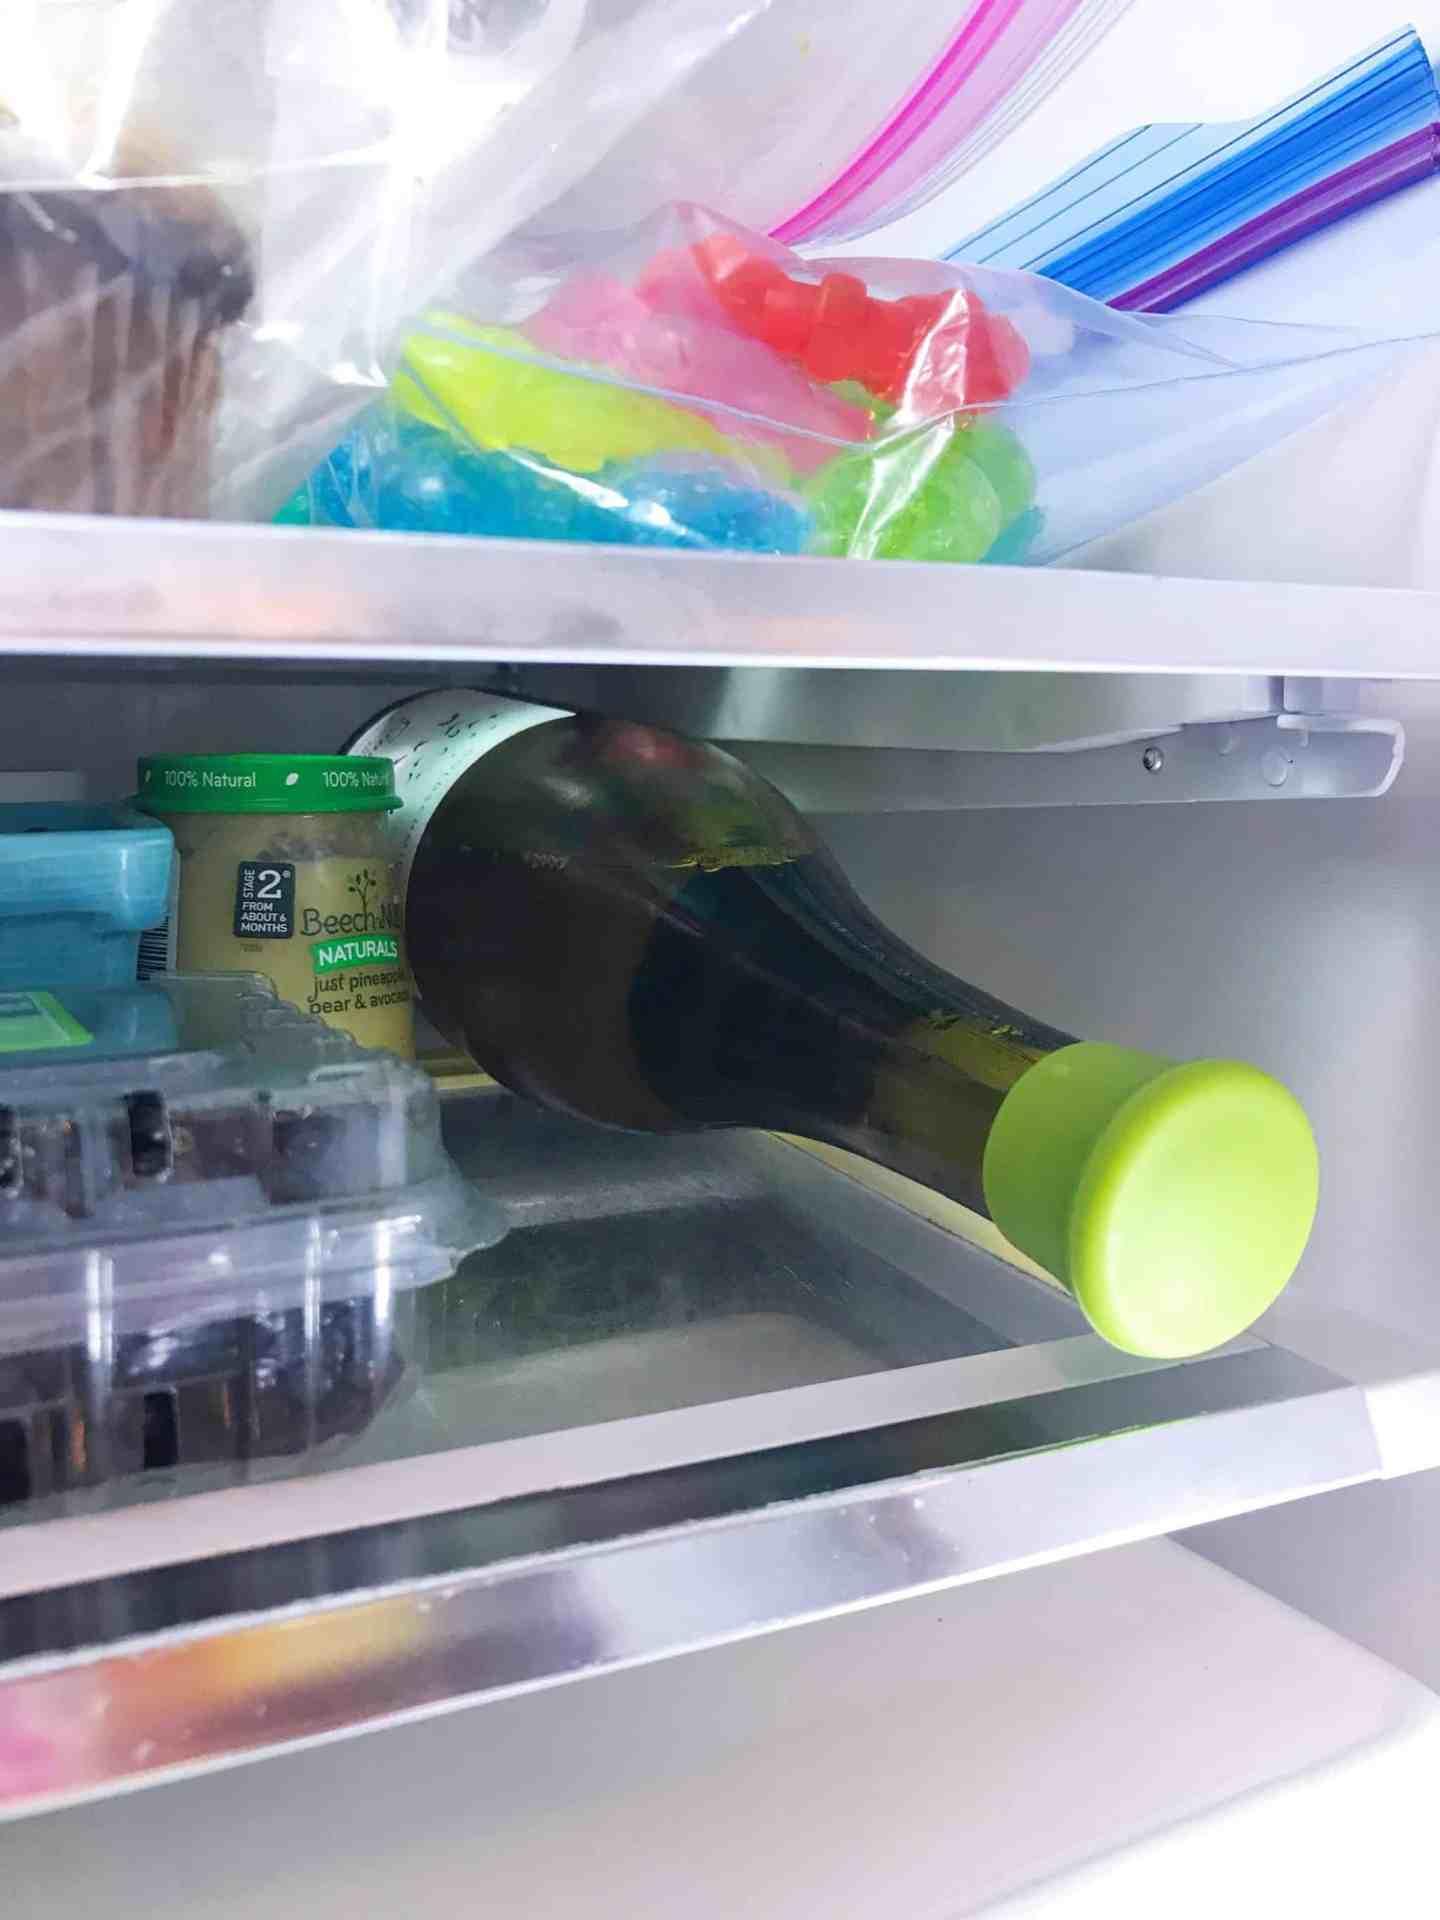 capabunga wine stopper